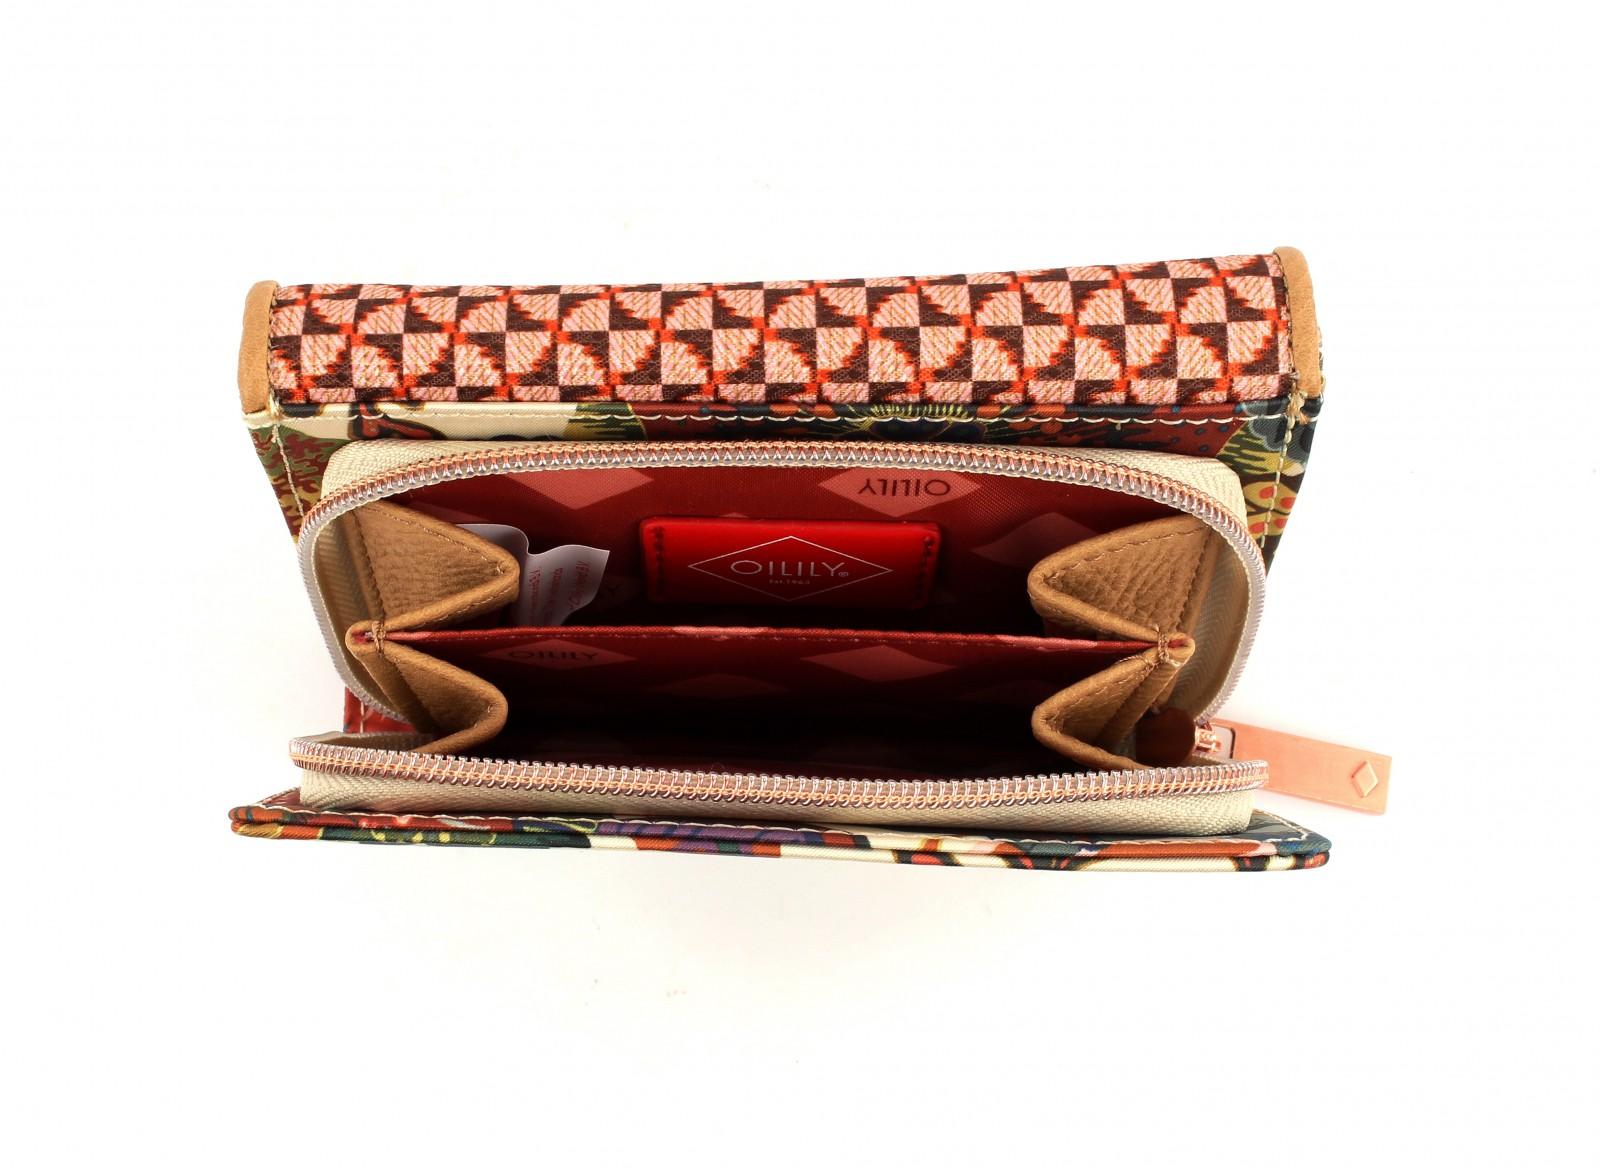 oilily kiwano s wallet geldb rse portemonnaie geldbeutel. Black Bedroom Furniture Sets. Home Design Ideas